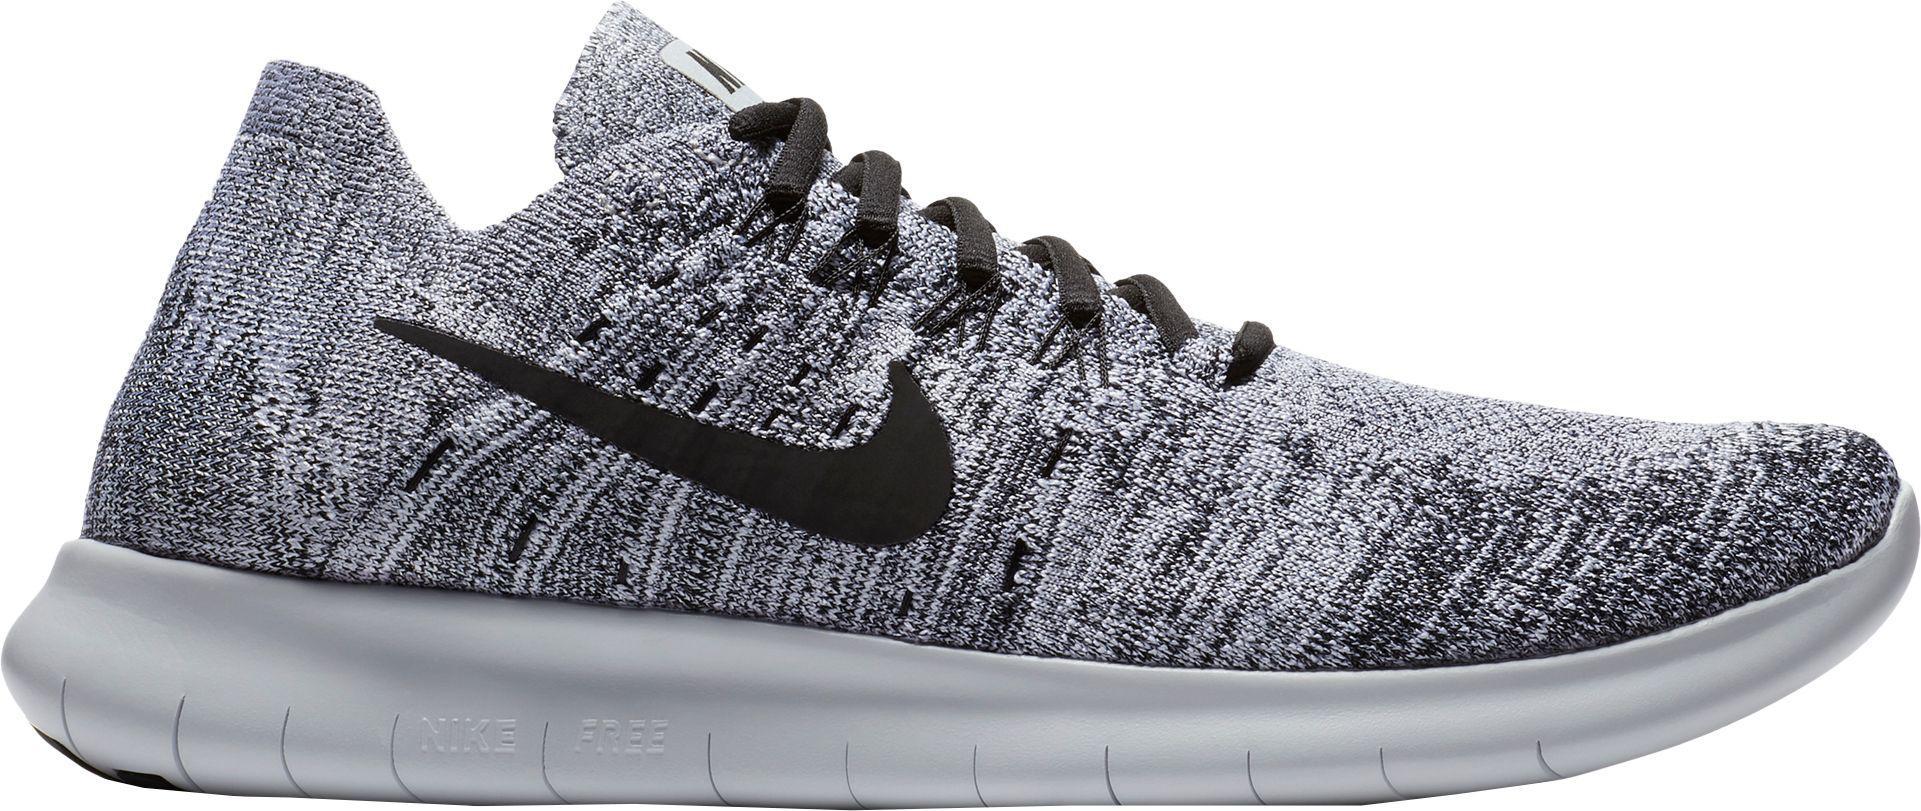 ba628b7260ed Lyst - Nike Free Rn Flyknit 2017 Running Shoes in Gray for Men